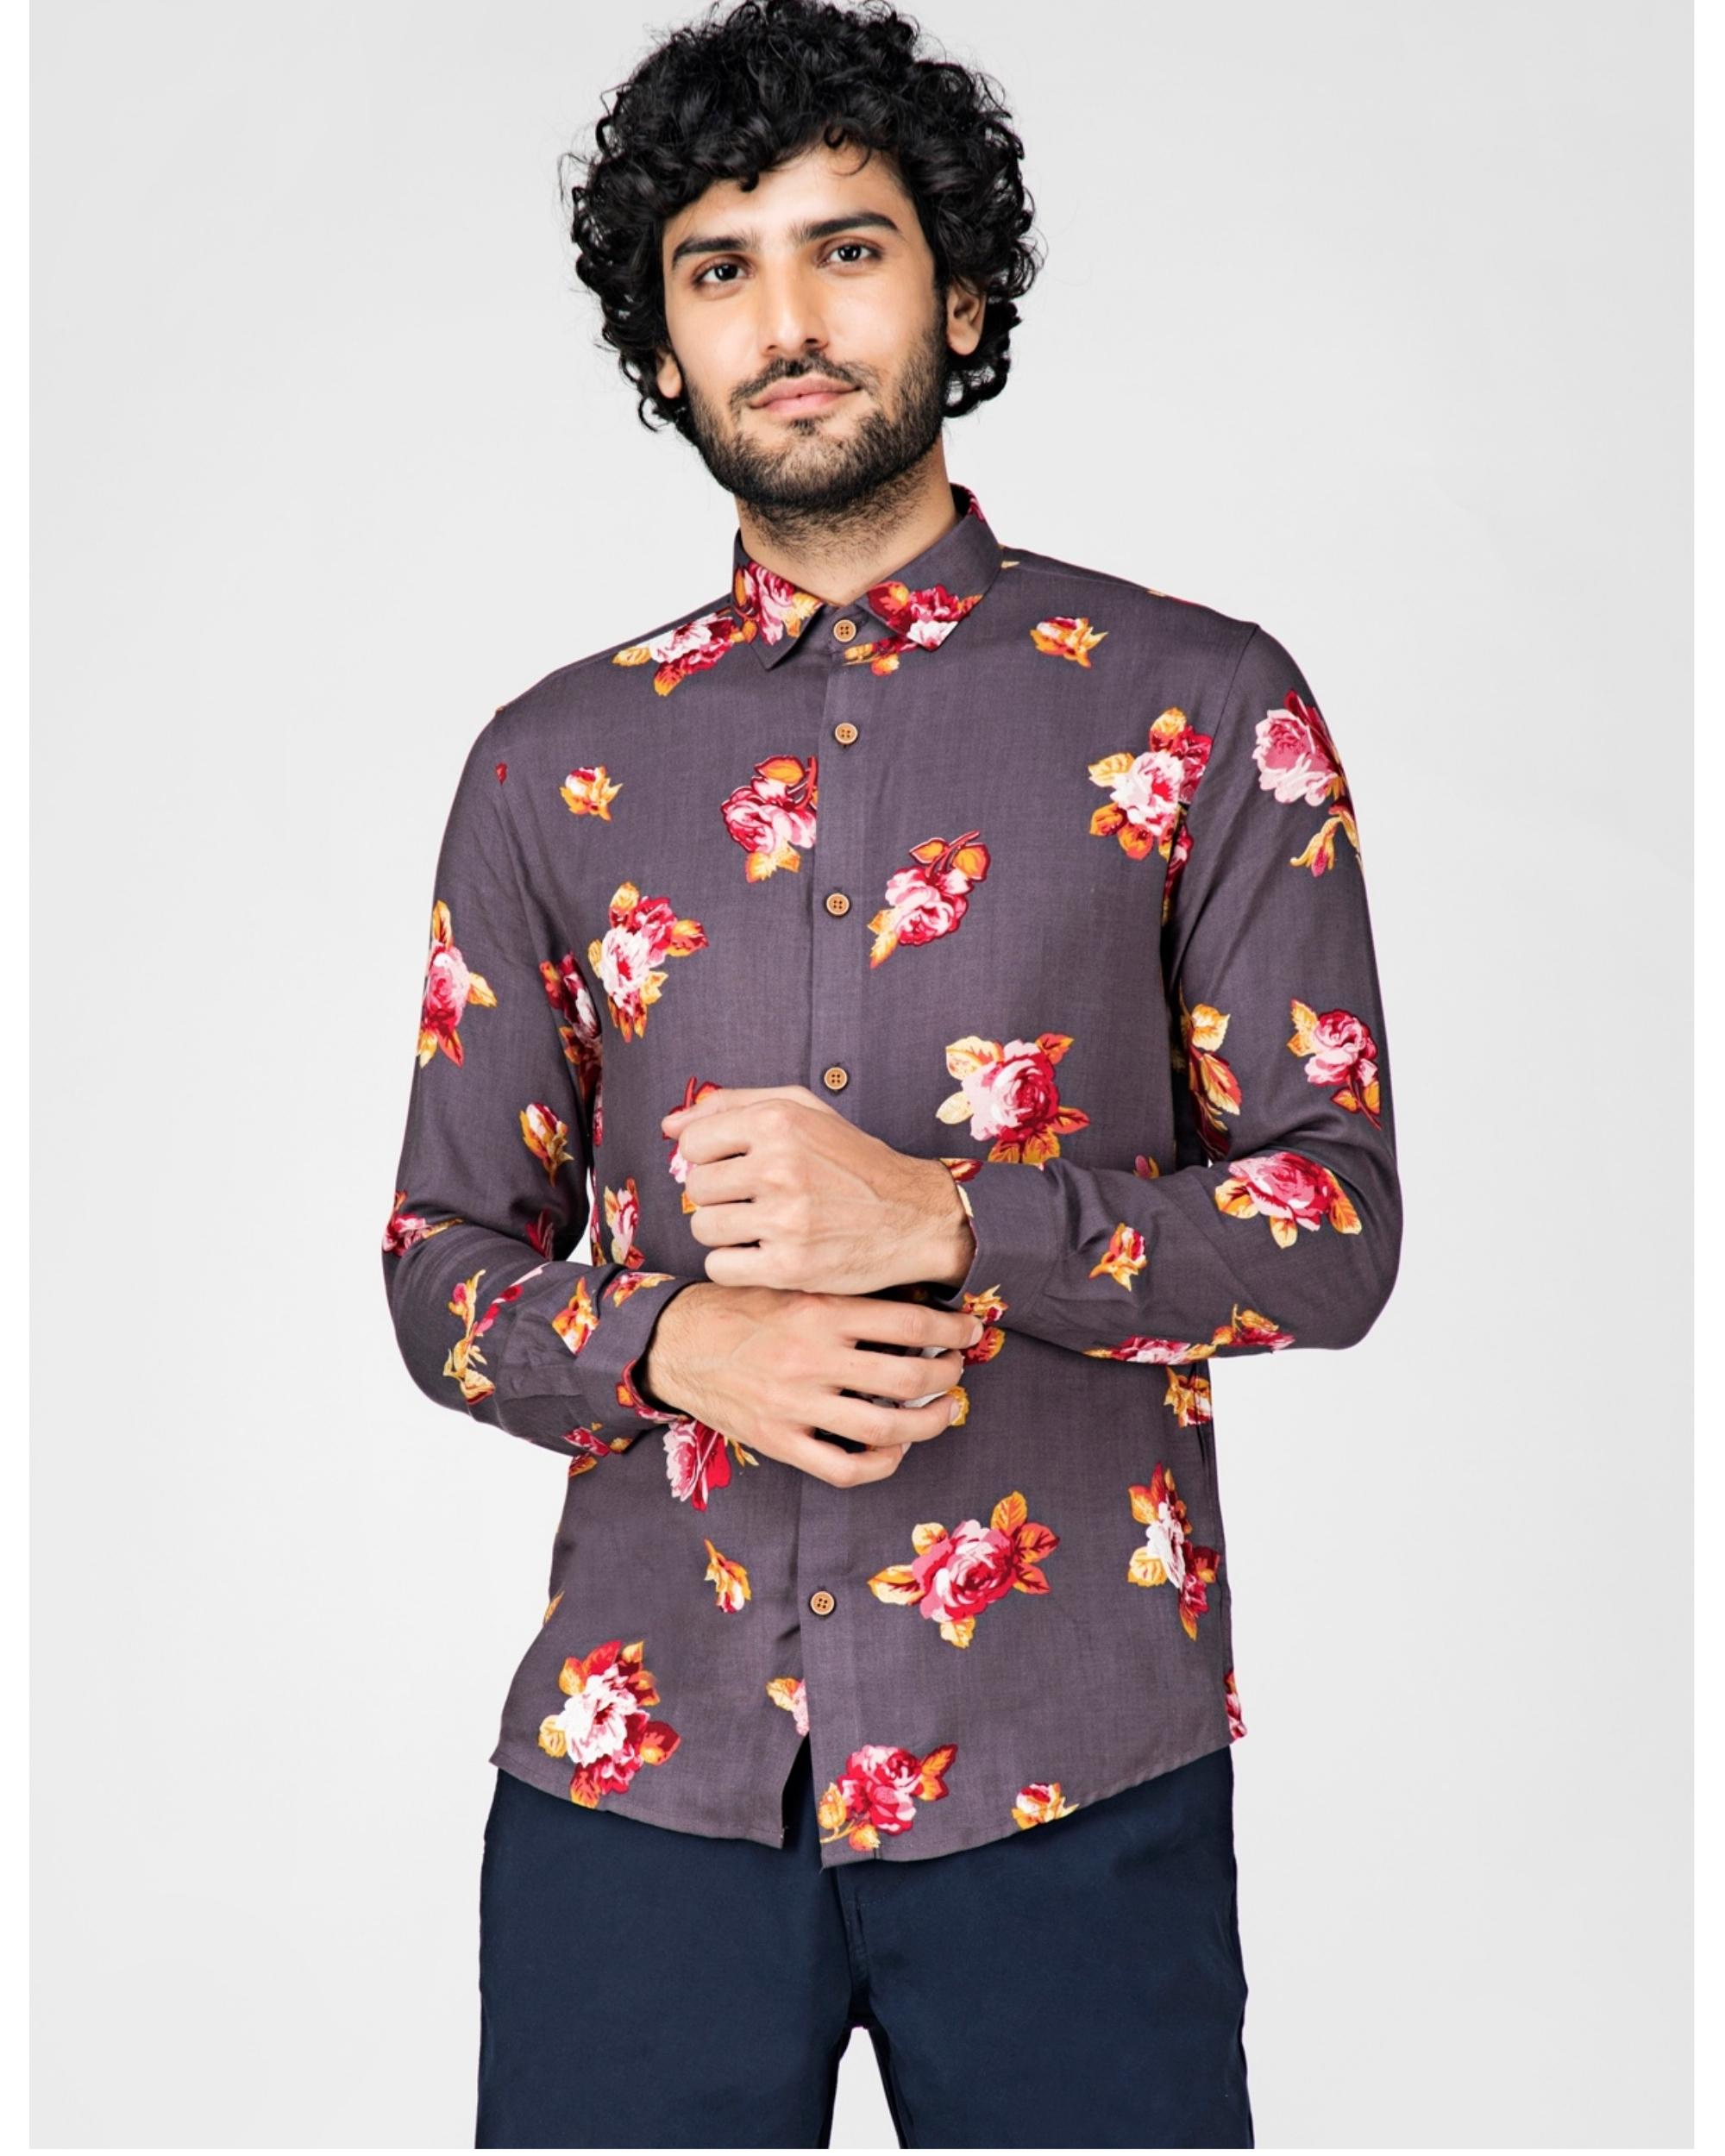 Grey floral printed casual shirt